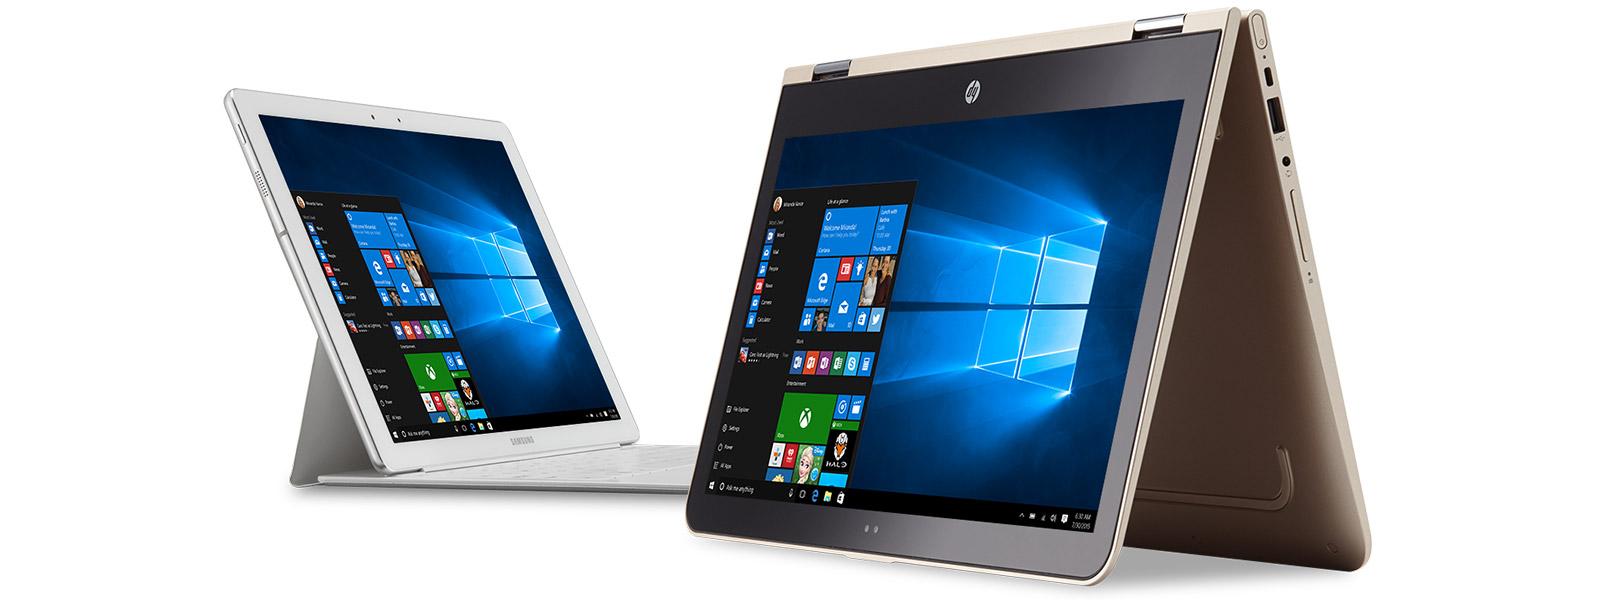 Microsoft devices with Windows start menu